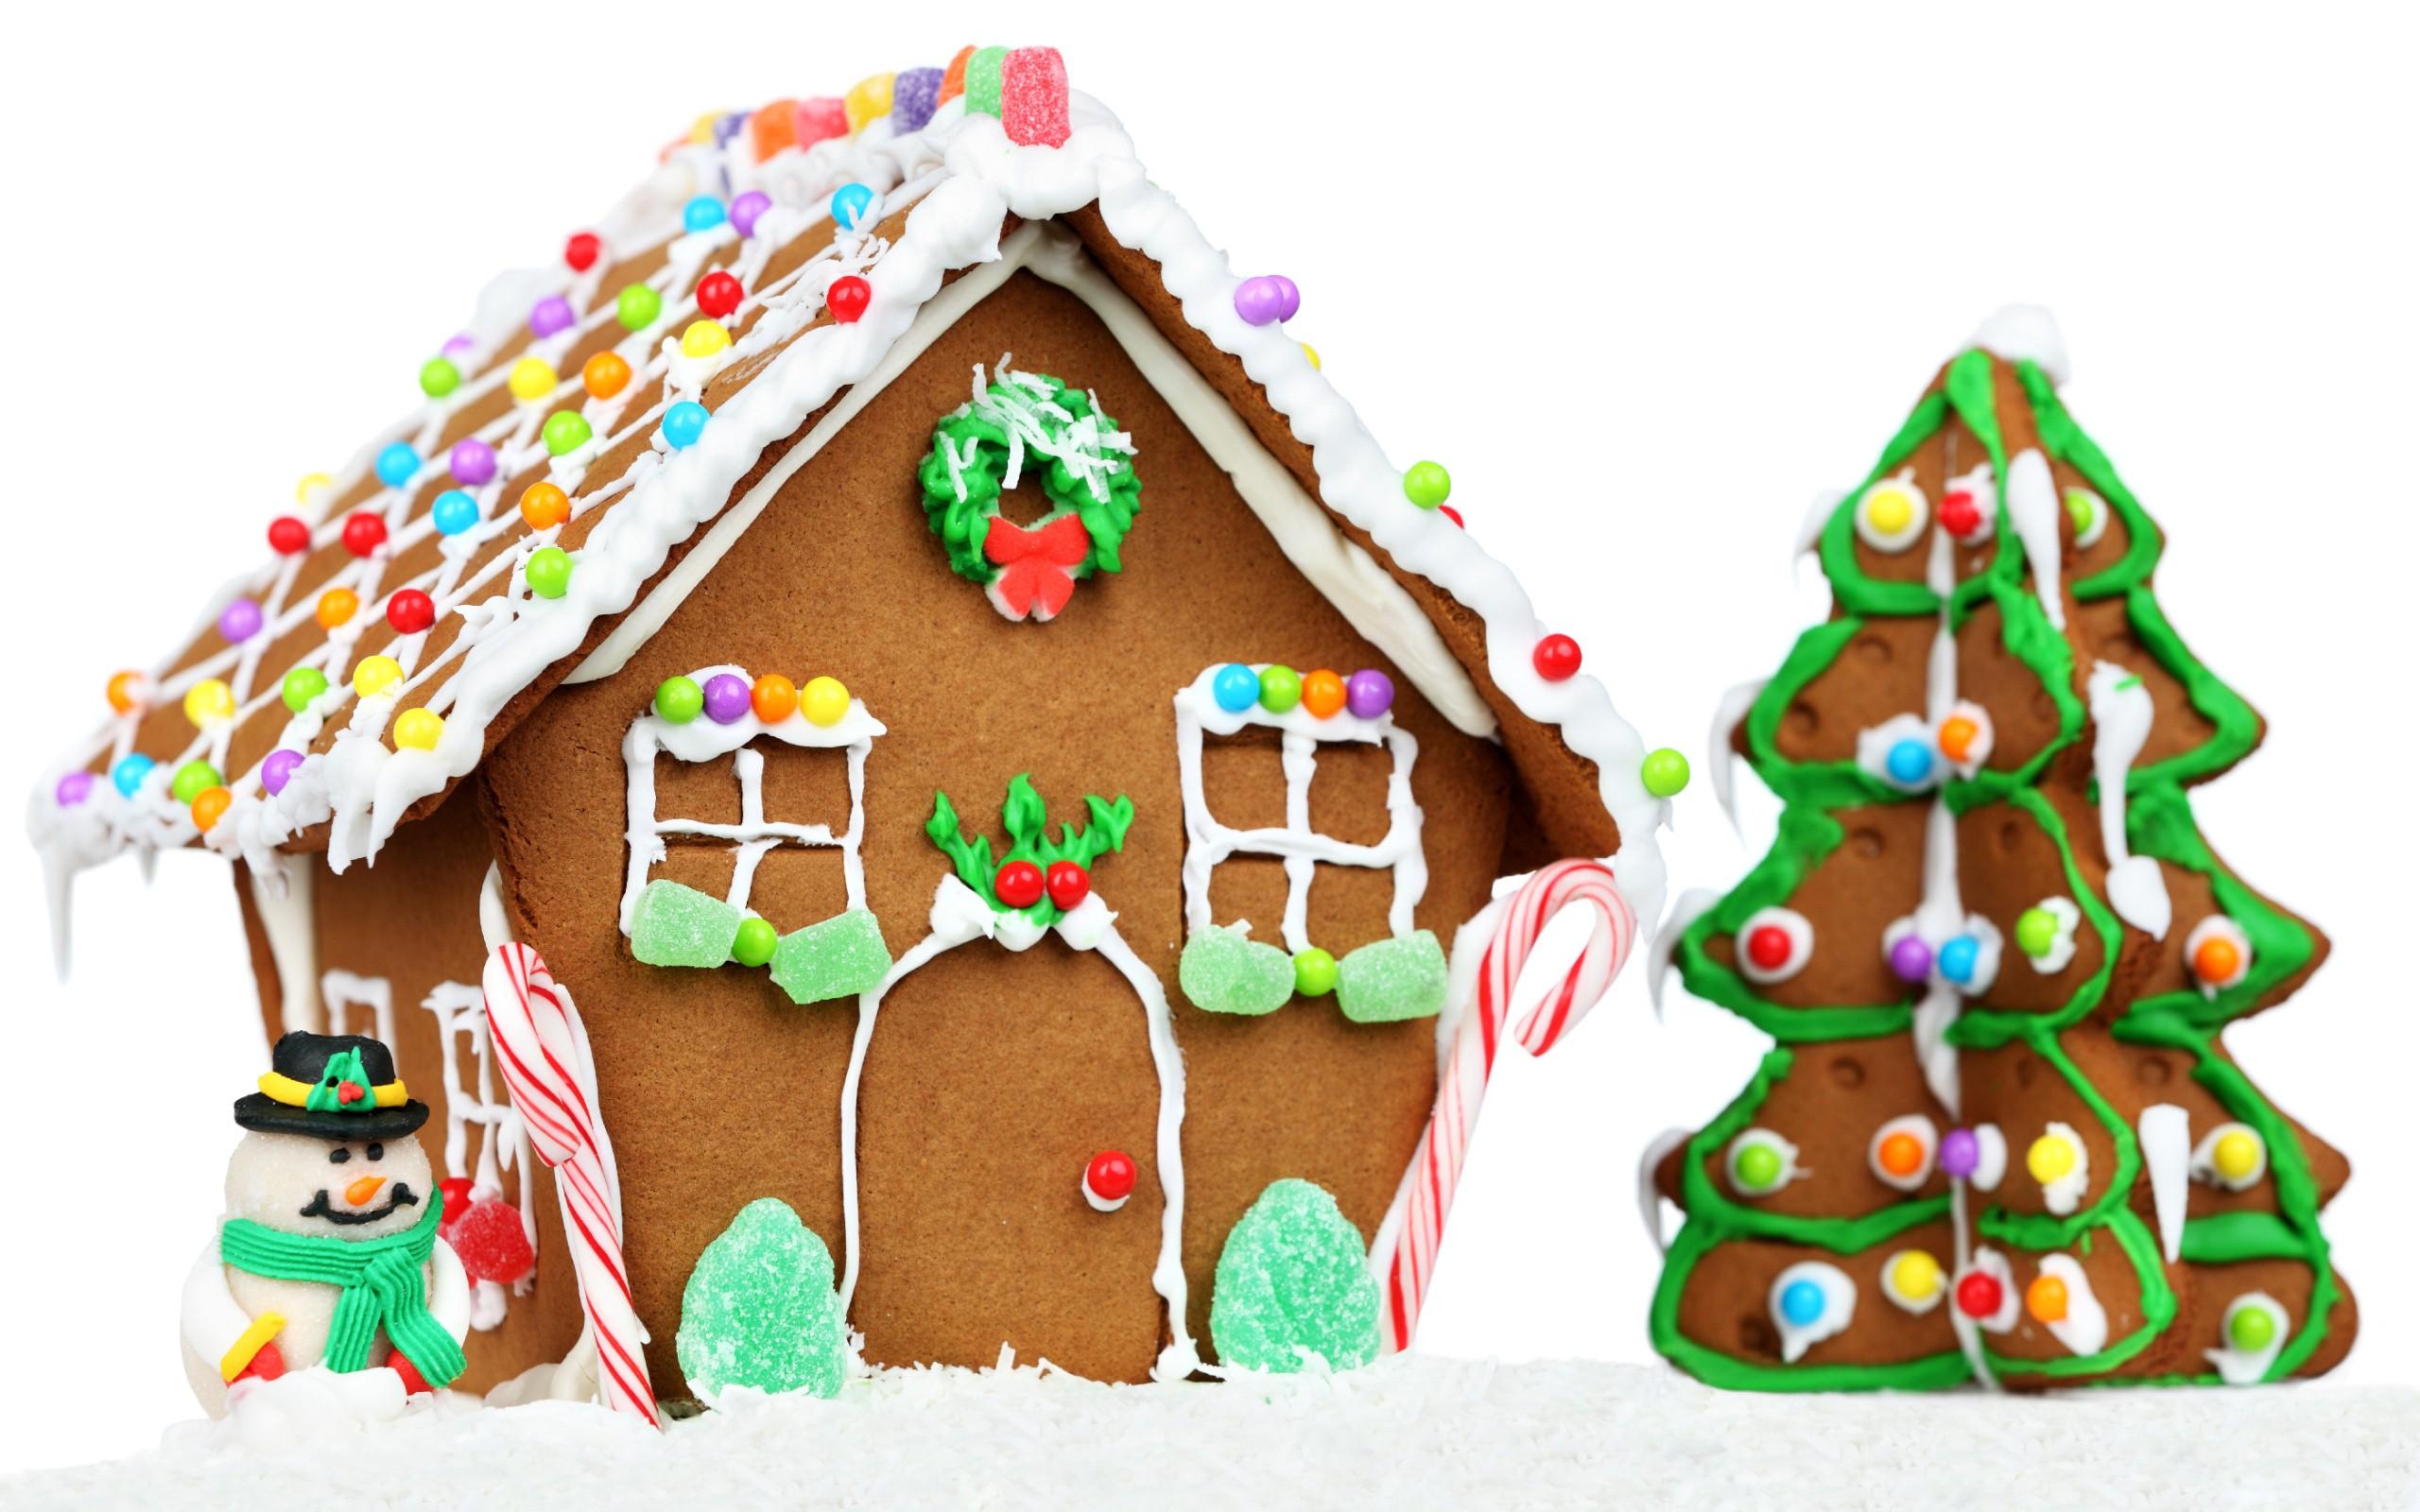 Hintergrundbilder Illustration Lebensmittel Weihnachten Kekse